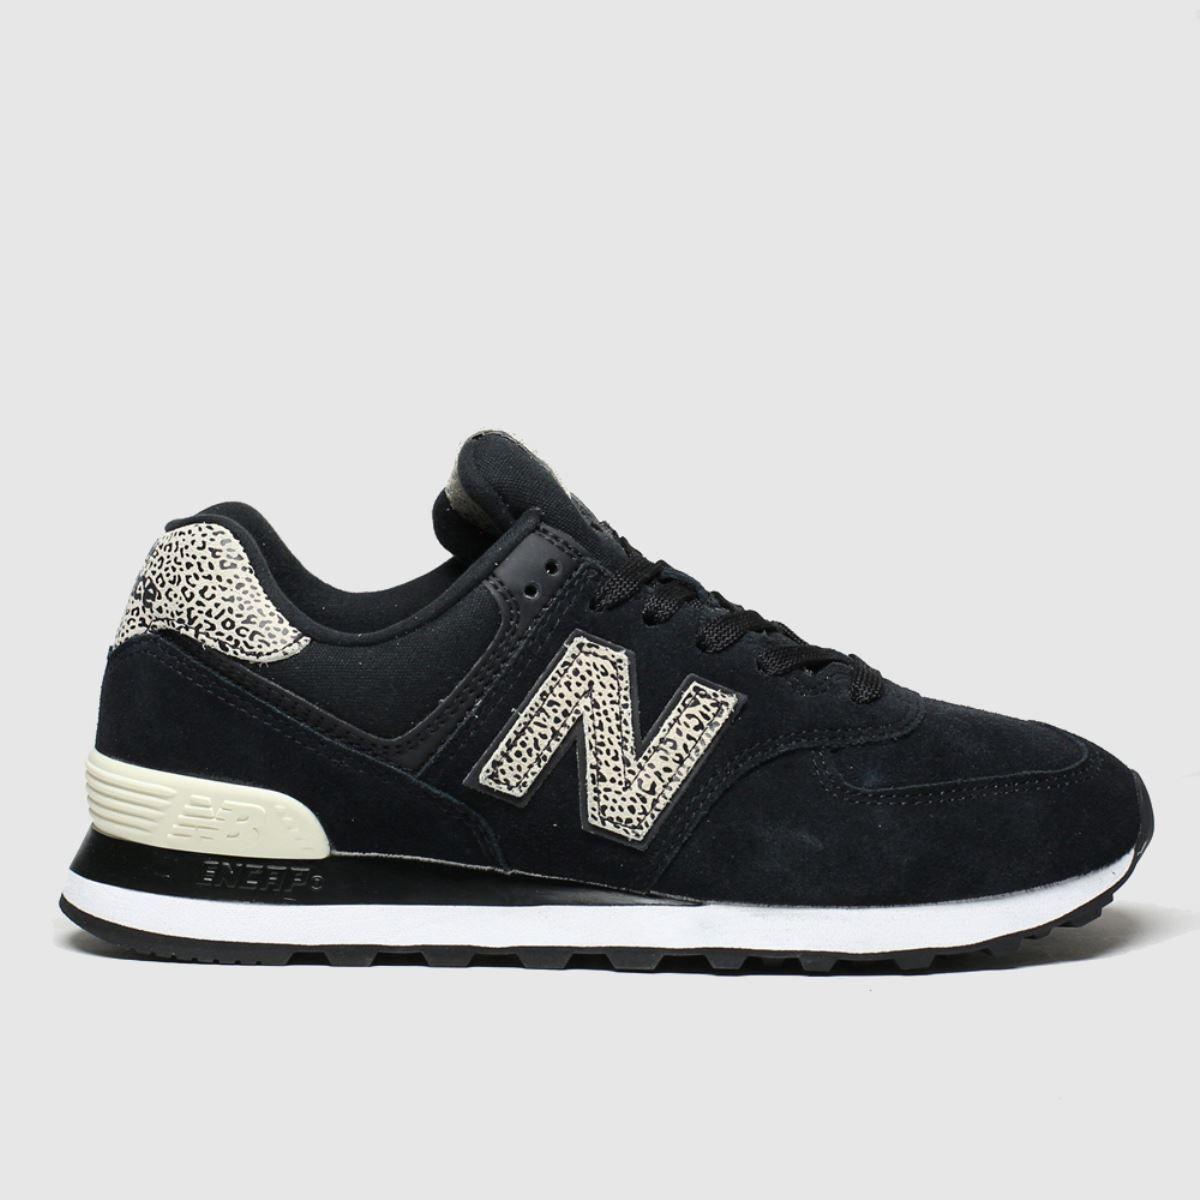 new balance trainers black